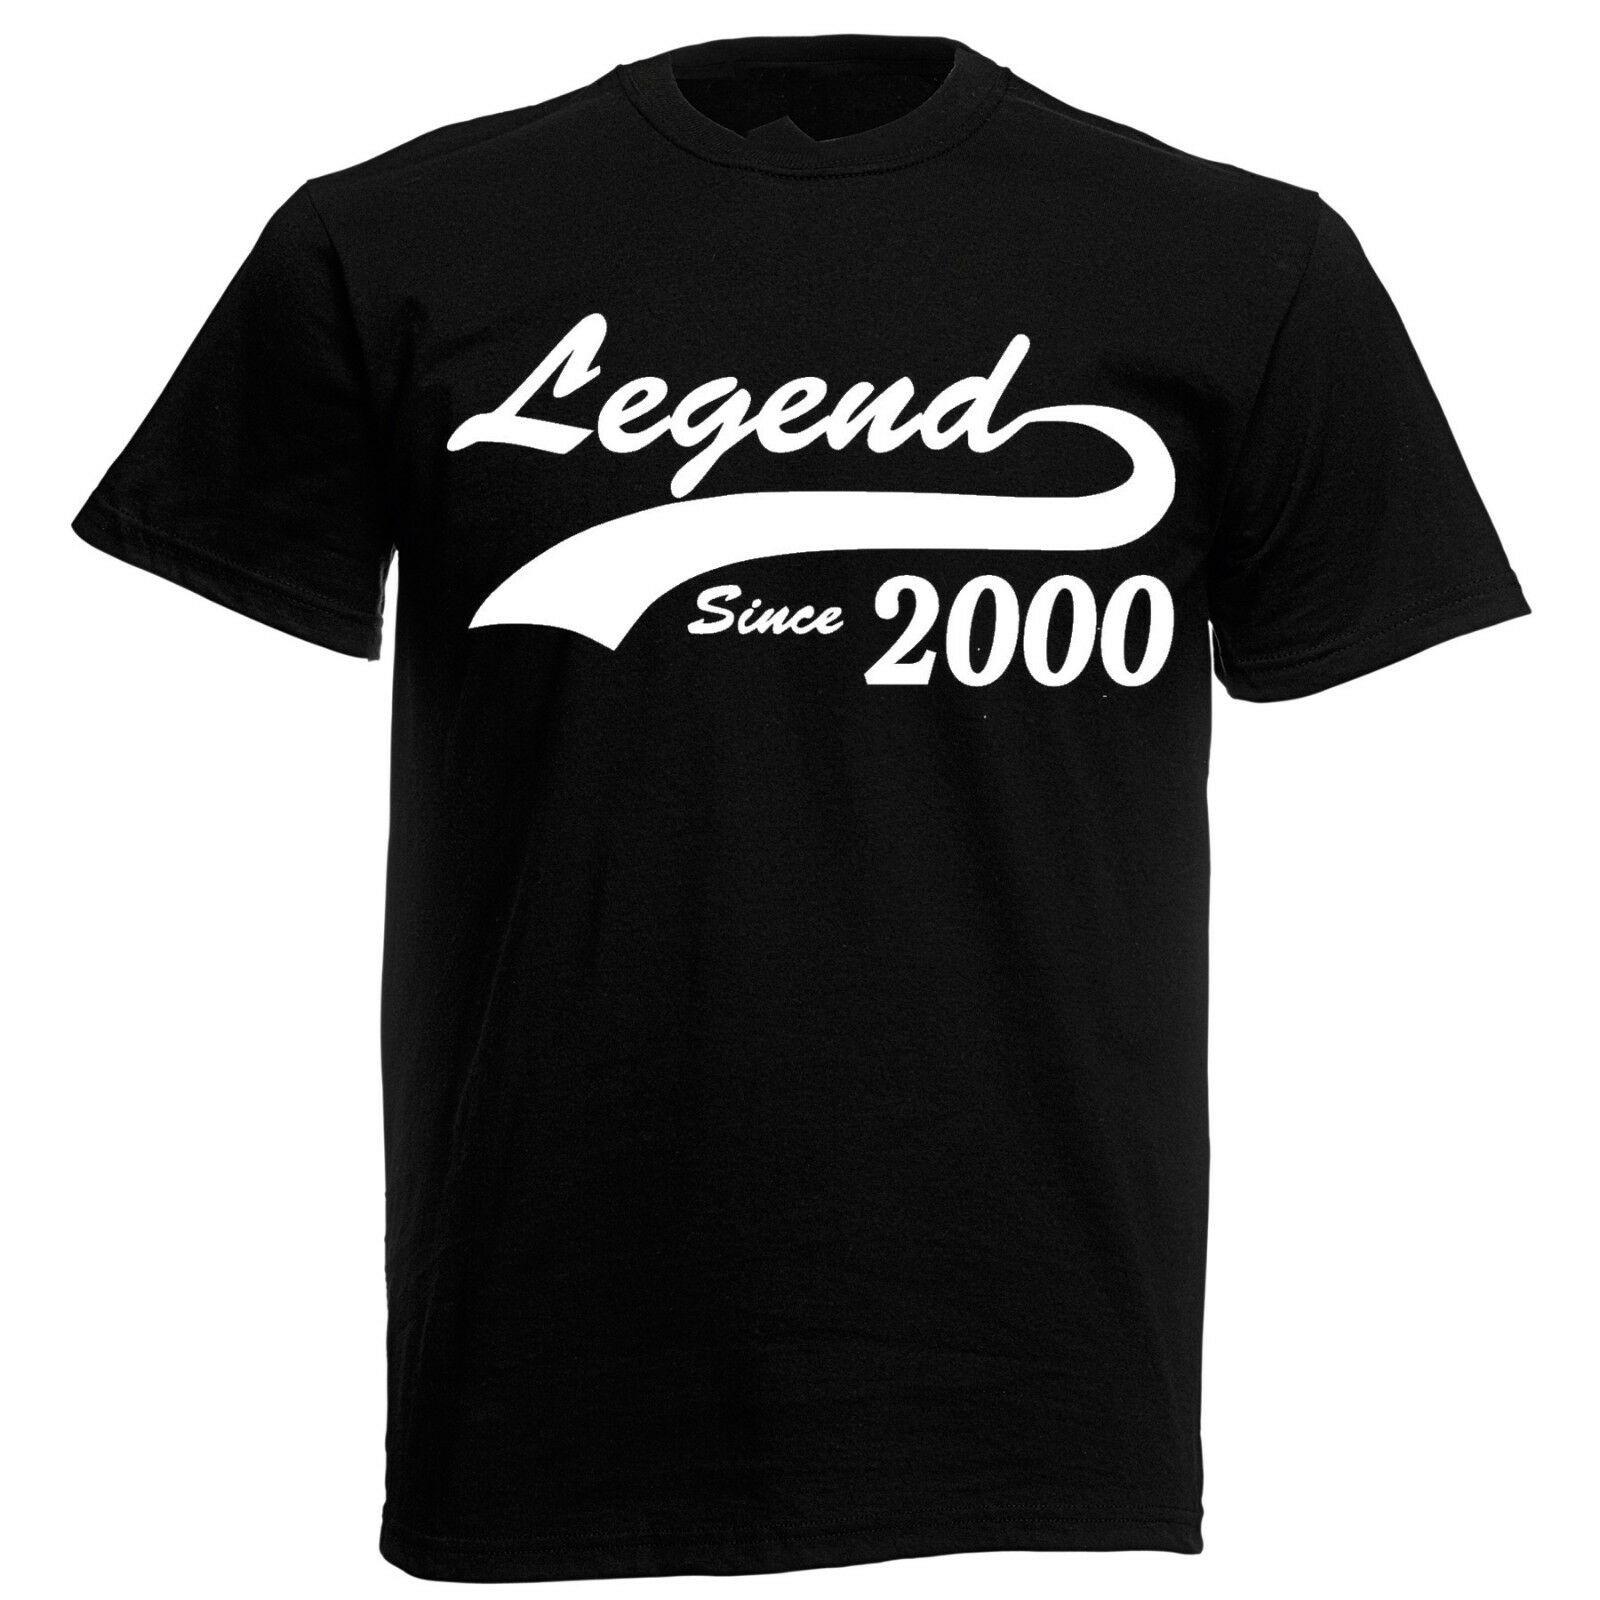 18th Birthday Gifts For Guys  Legend 2000 T Shirt mens 18th birthday ts presents